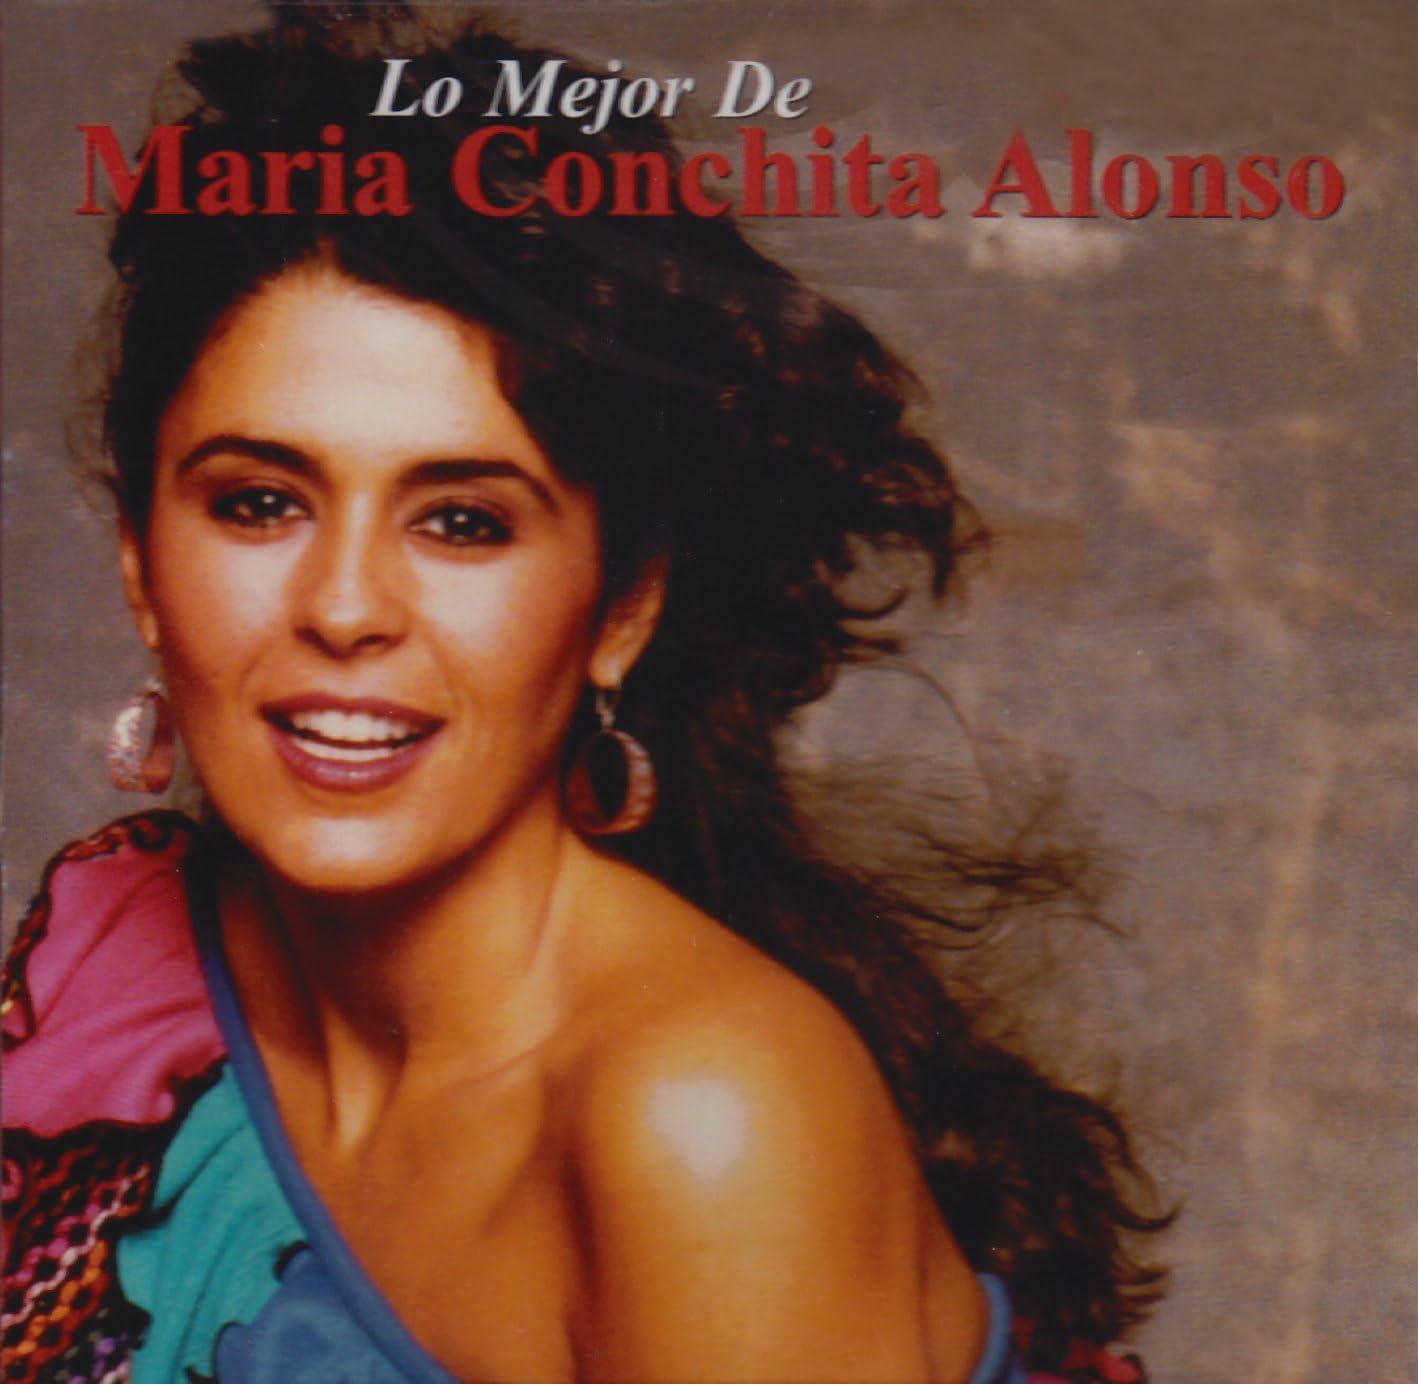 Lo Mejor De Maria Conchita Alonso [Importado]: Amazon.com.mx: Música